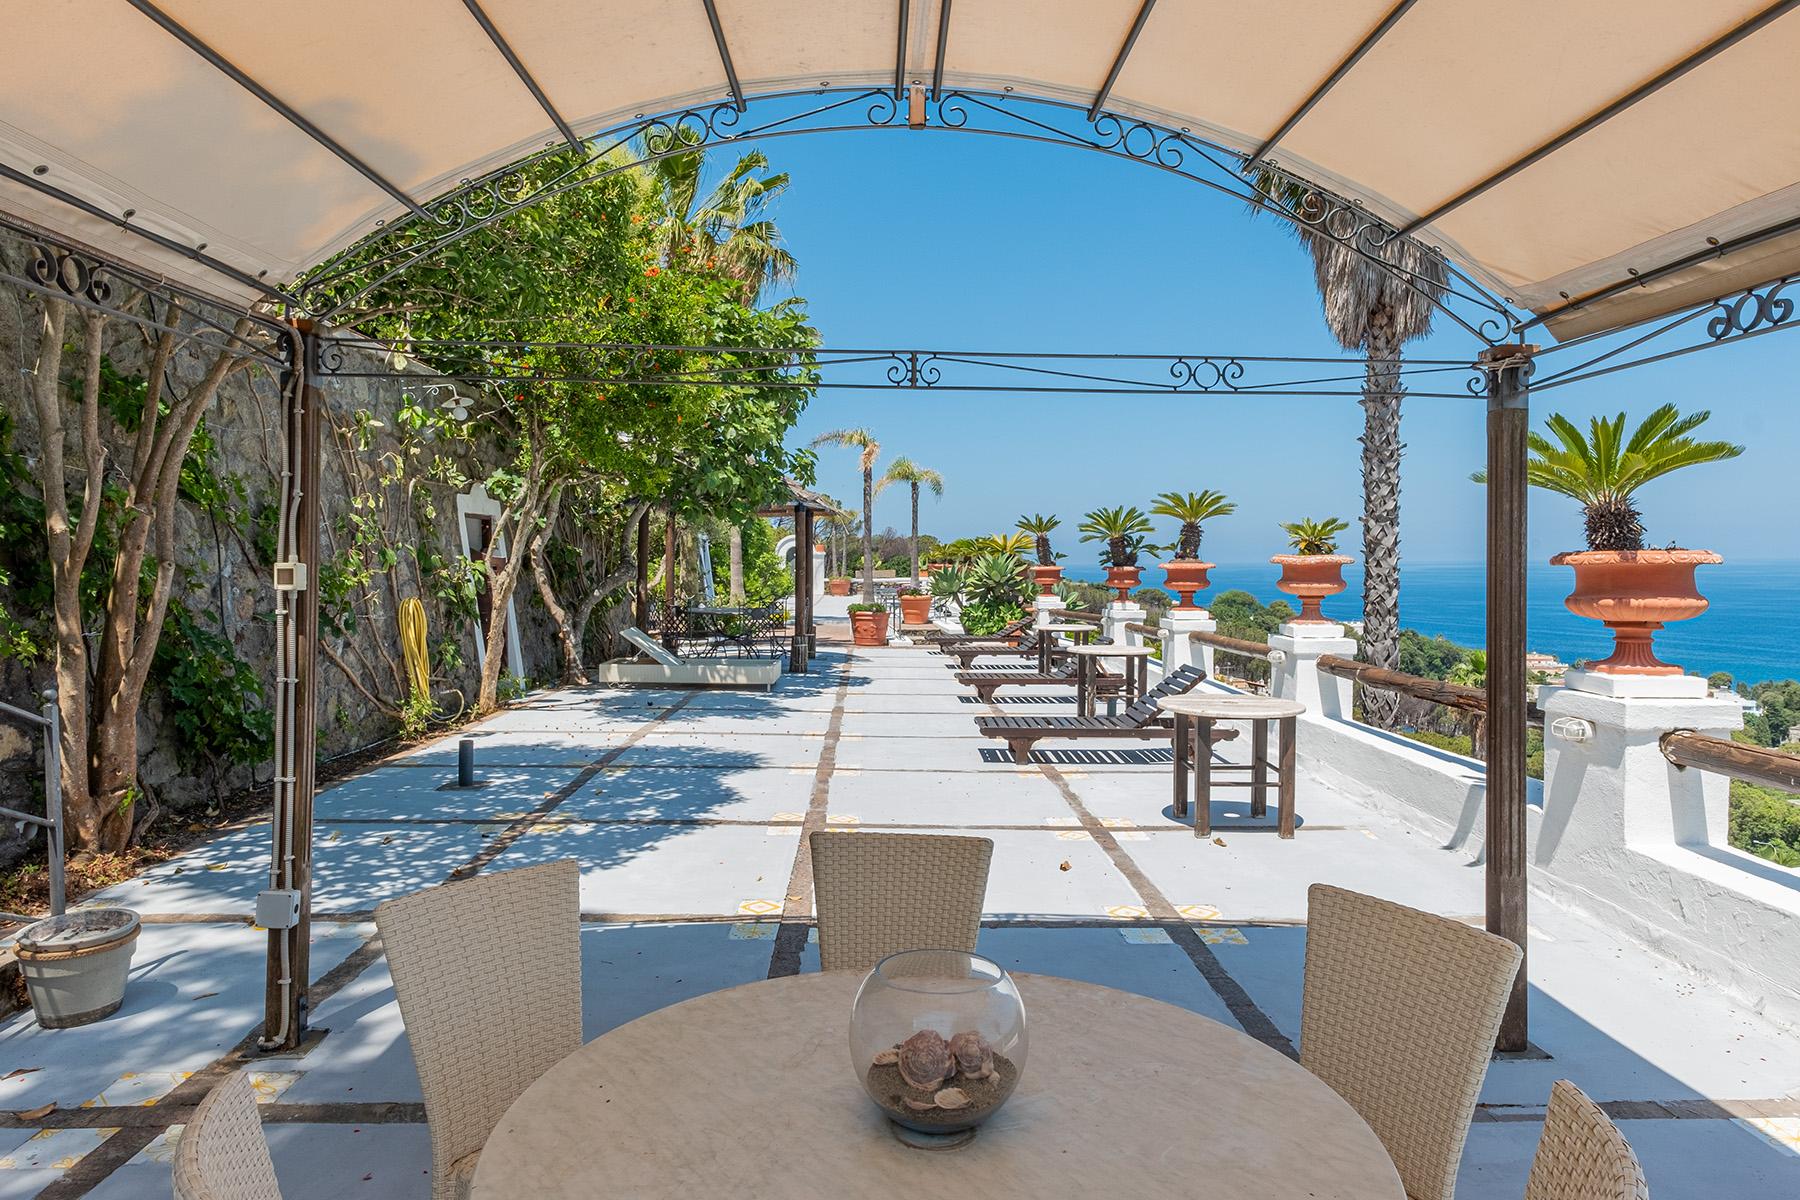 Villa in Vendita a Ischia: 5 locali, 500 mq - Foto 23